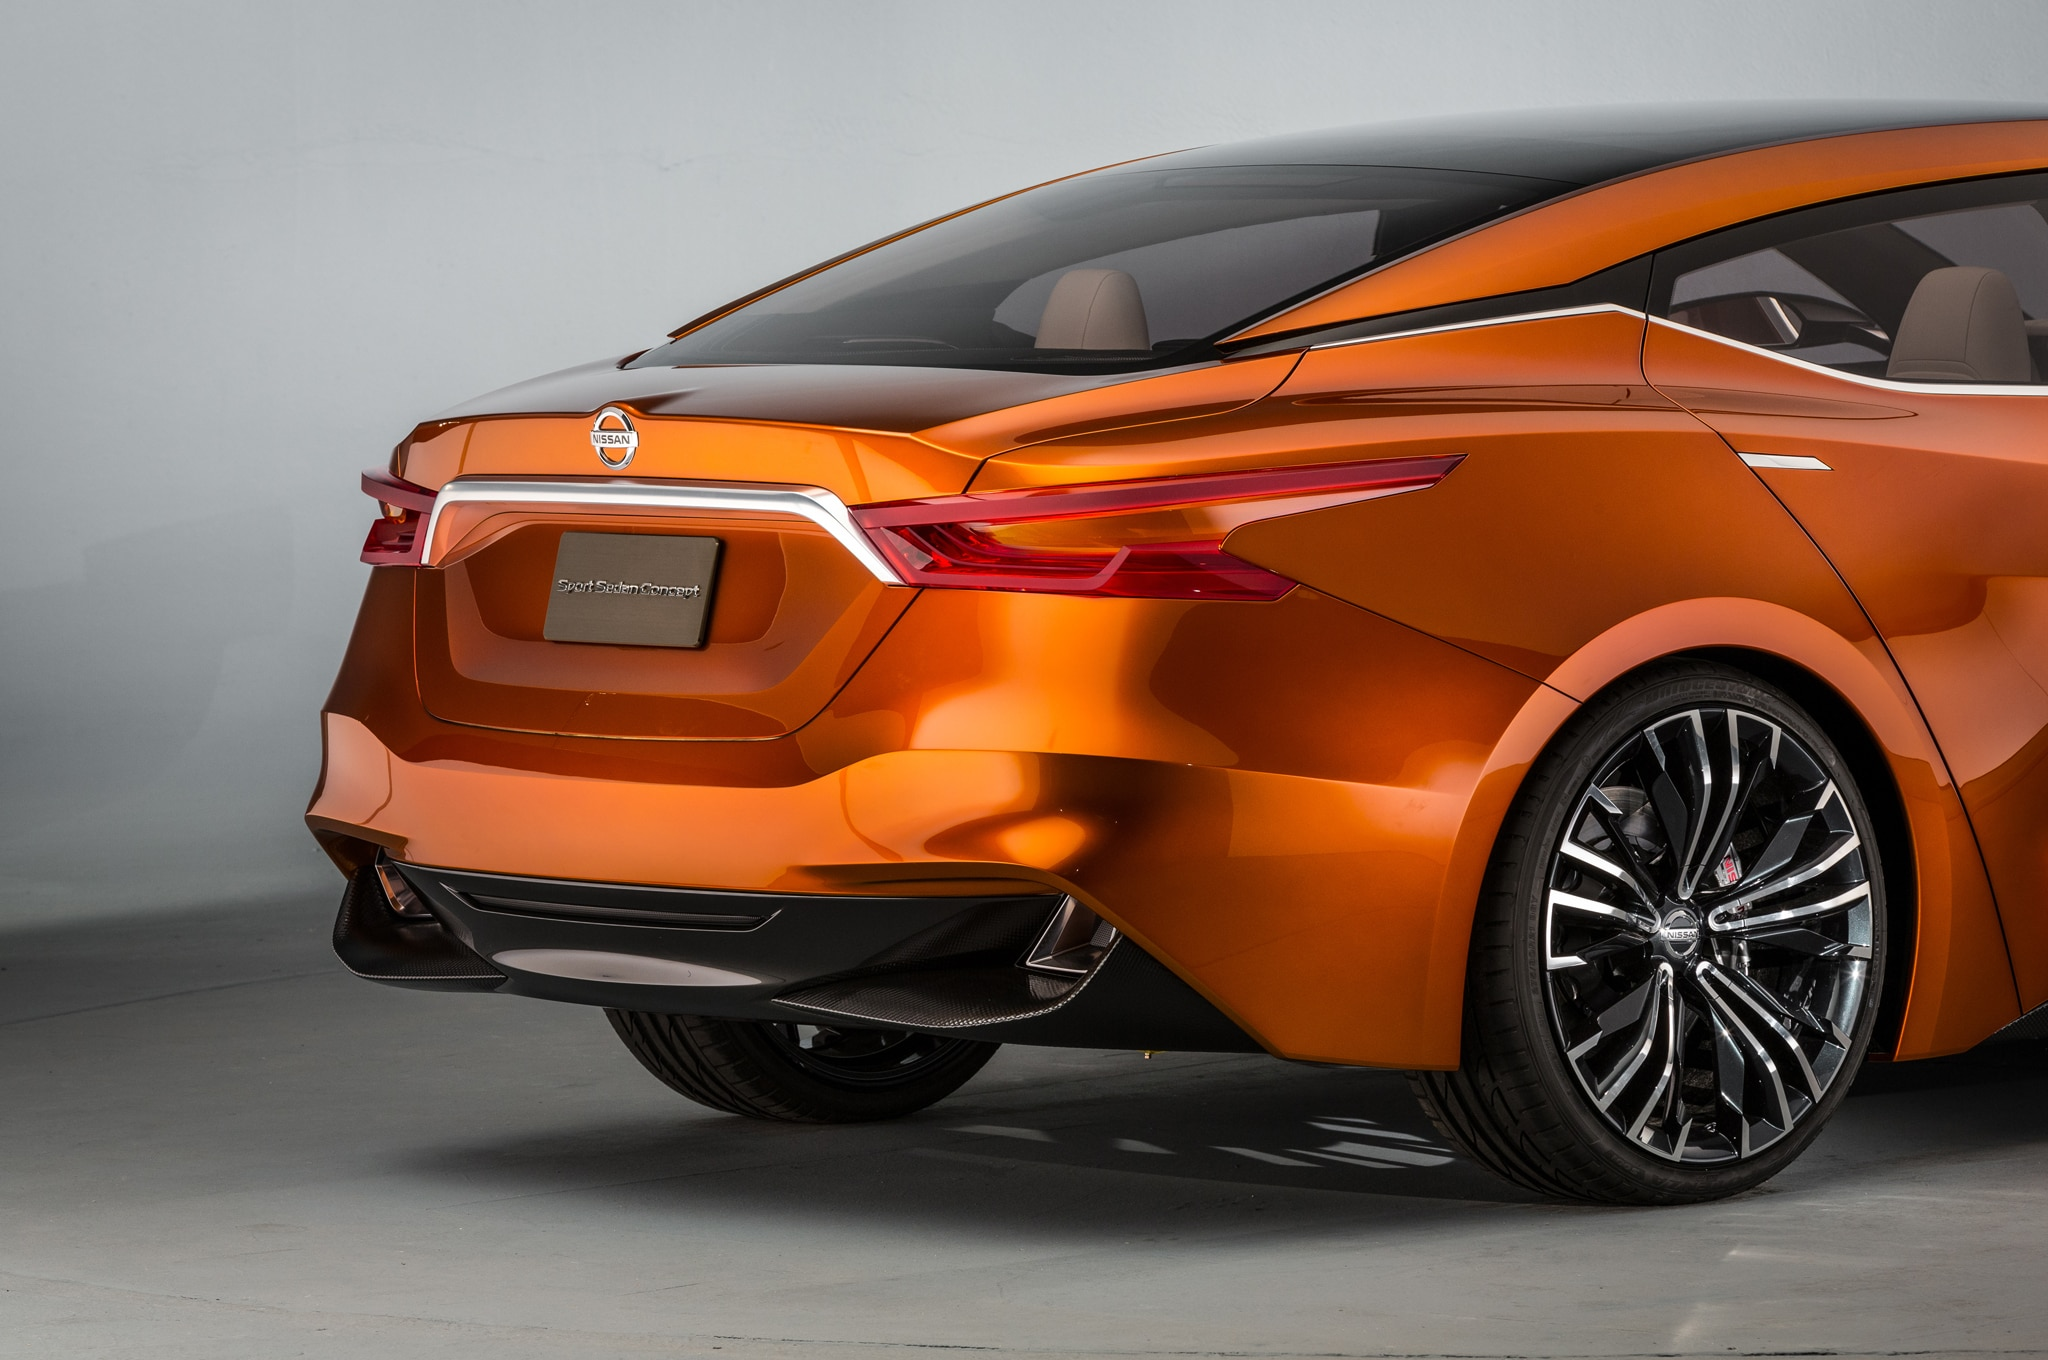 Sedan Automobile: Nissan Sport Sedan Concept Debuts At 2014 Detroit Auto